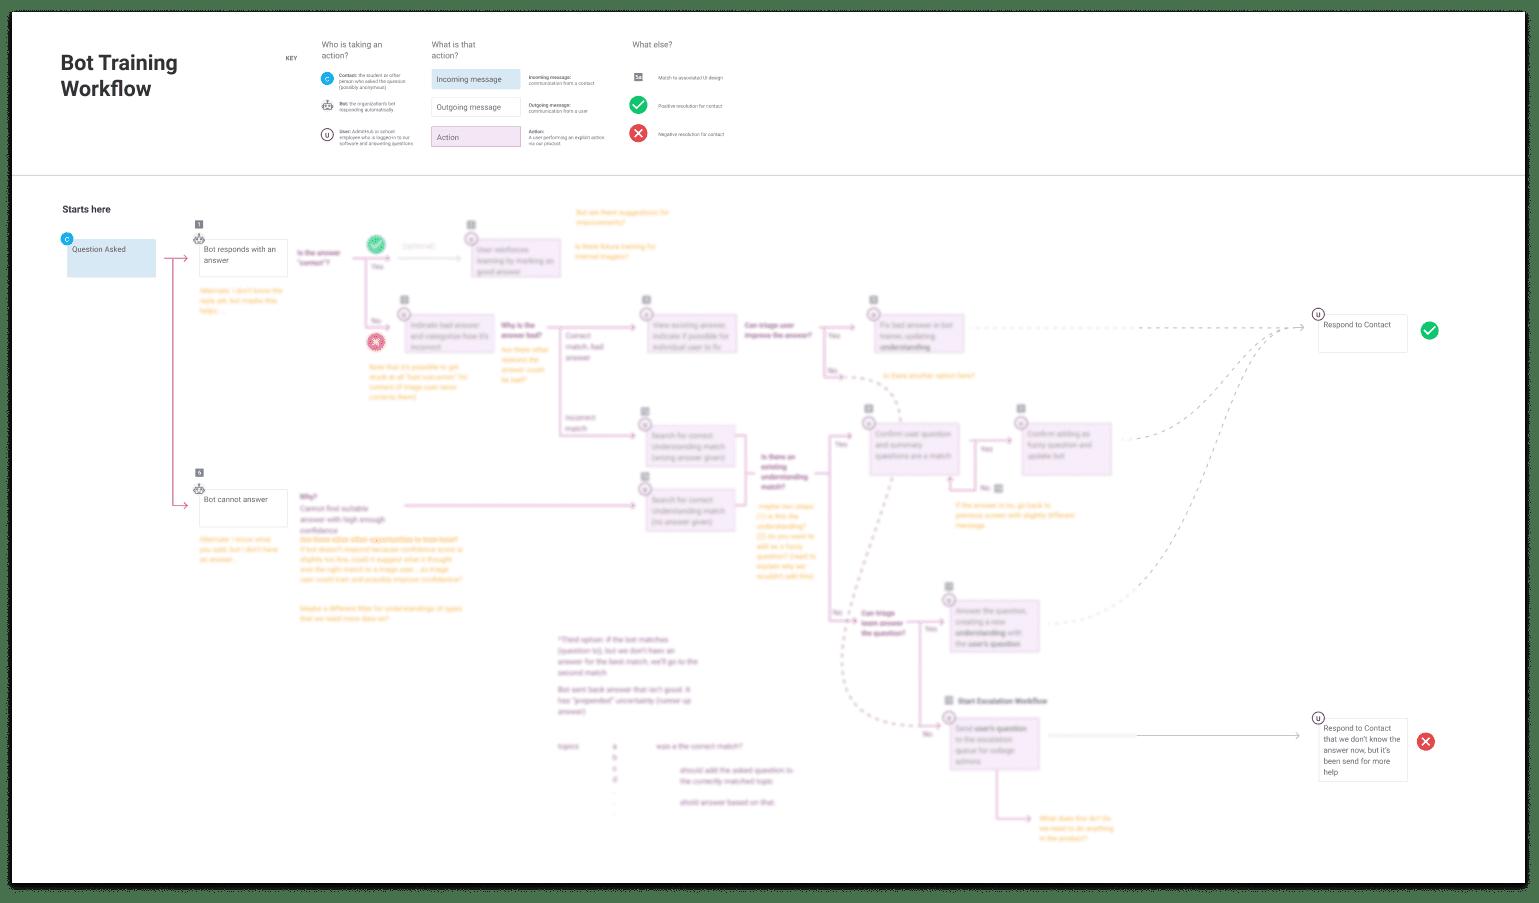 bot training decision tree